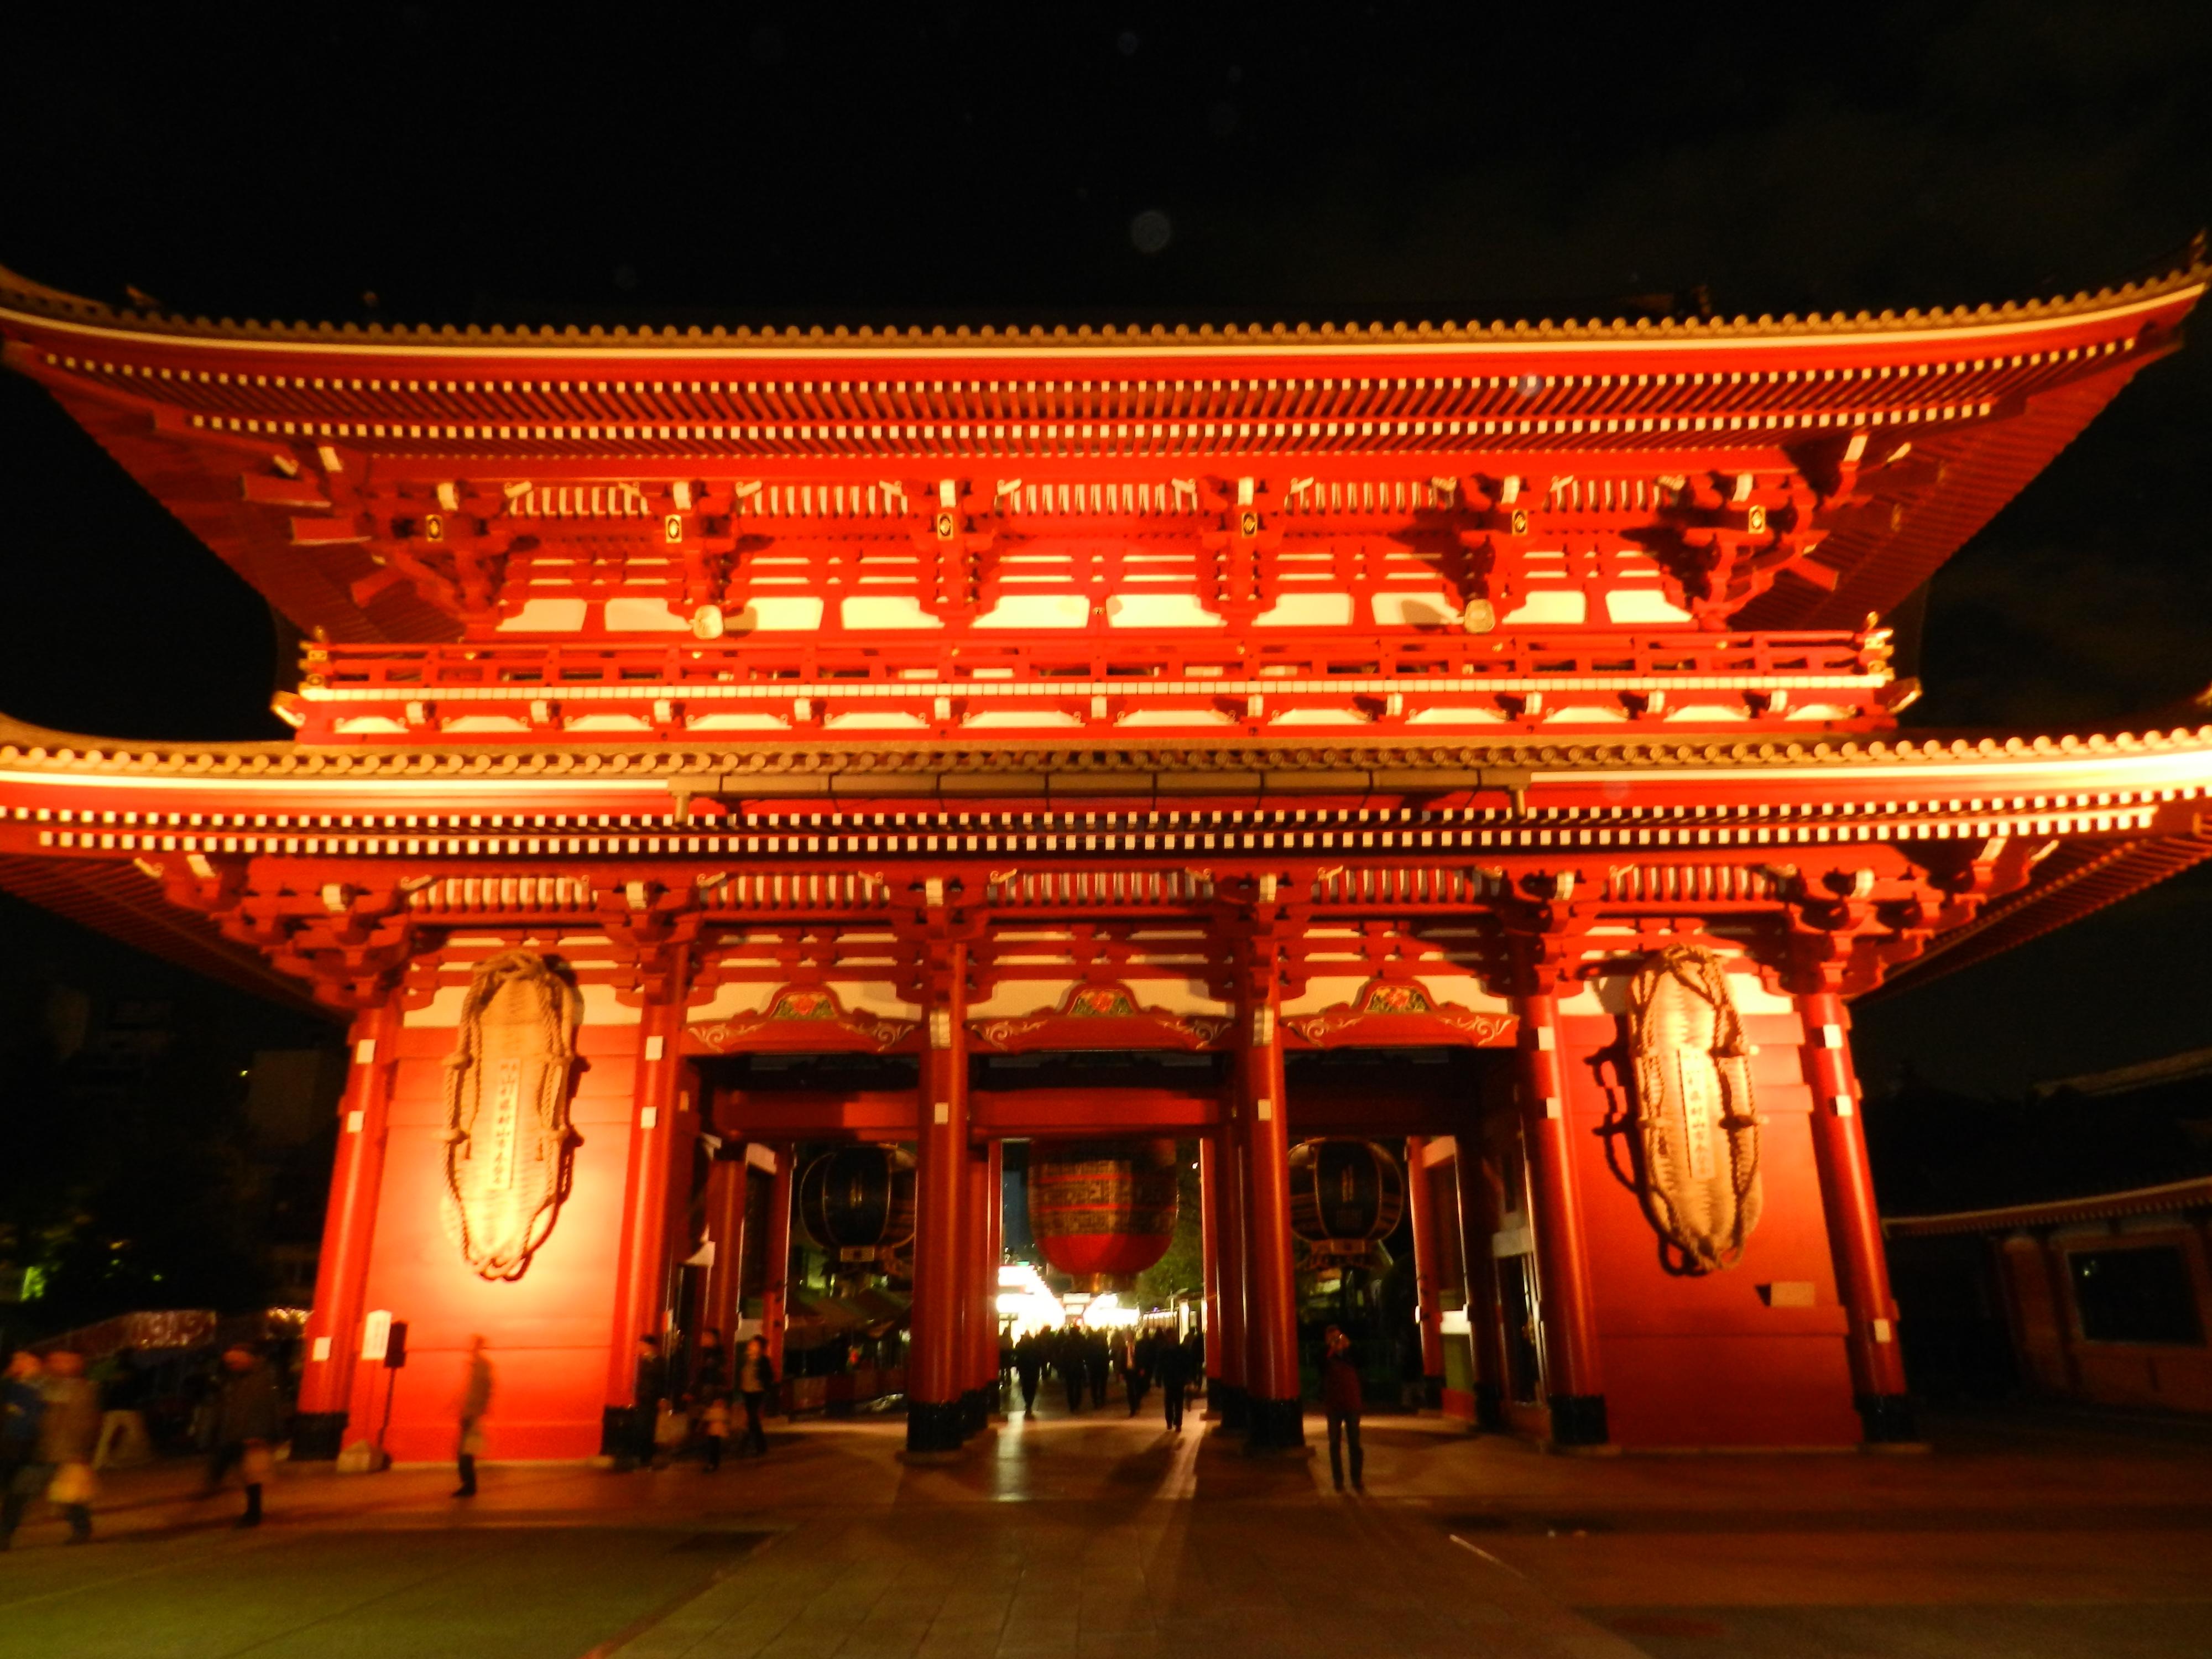 Sensō-ji. Il Tempio Buddhista più antico di Tōkyō.